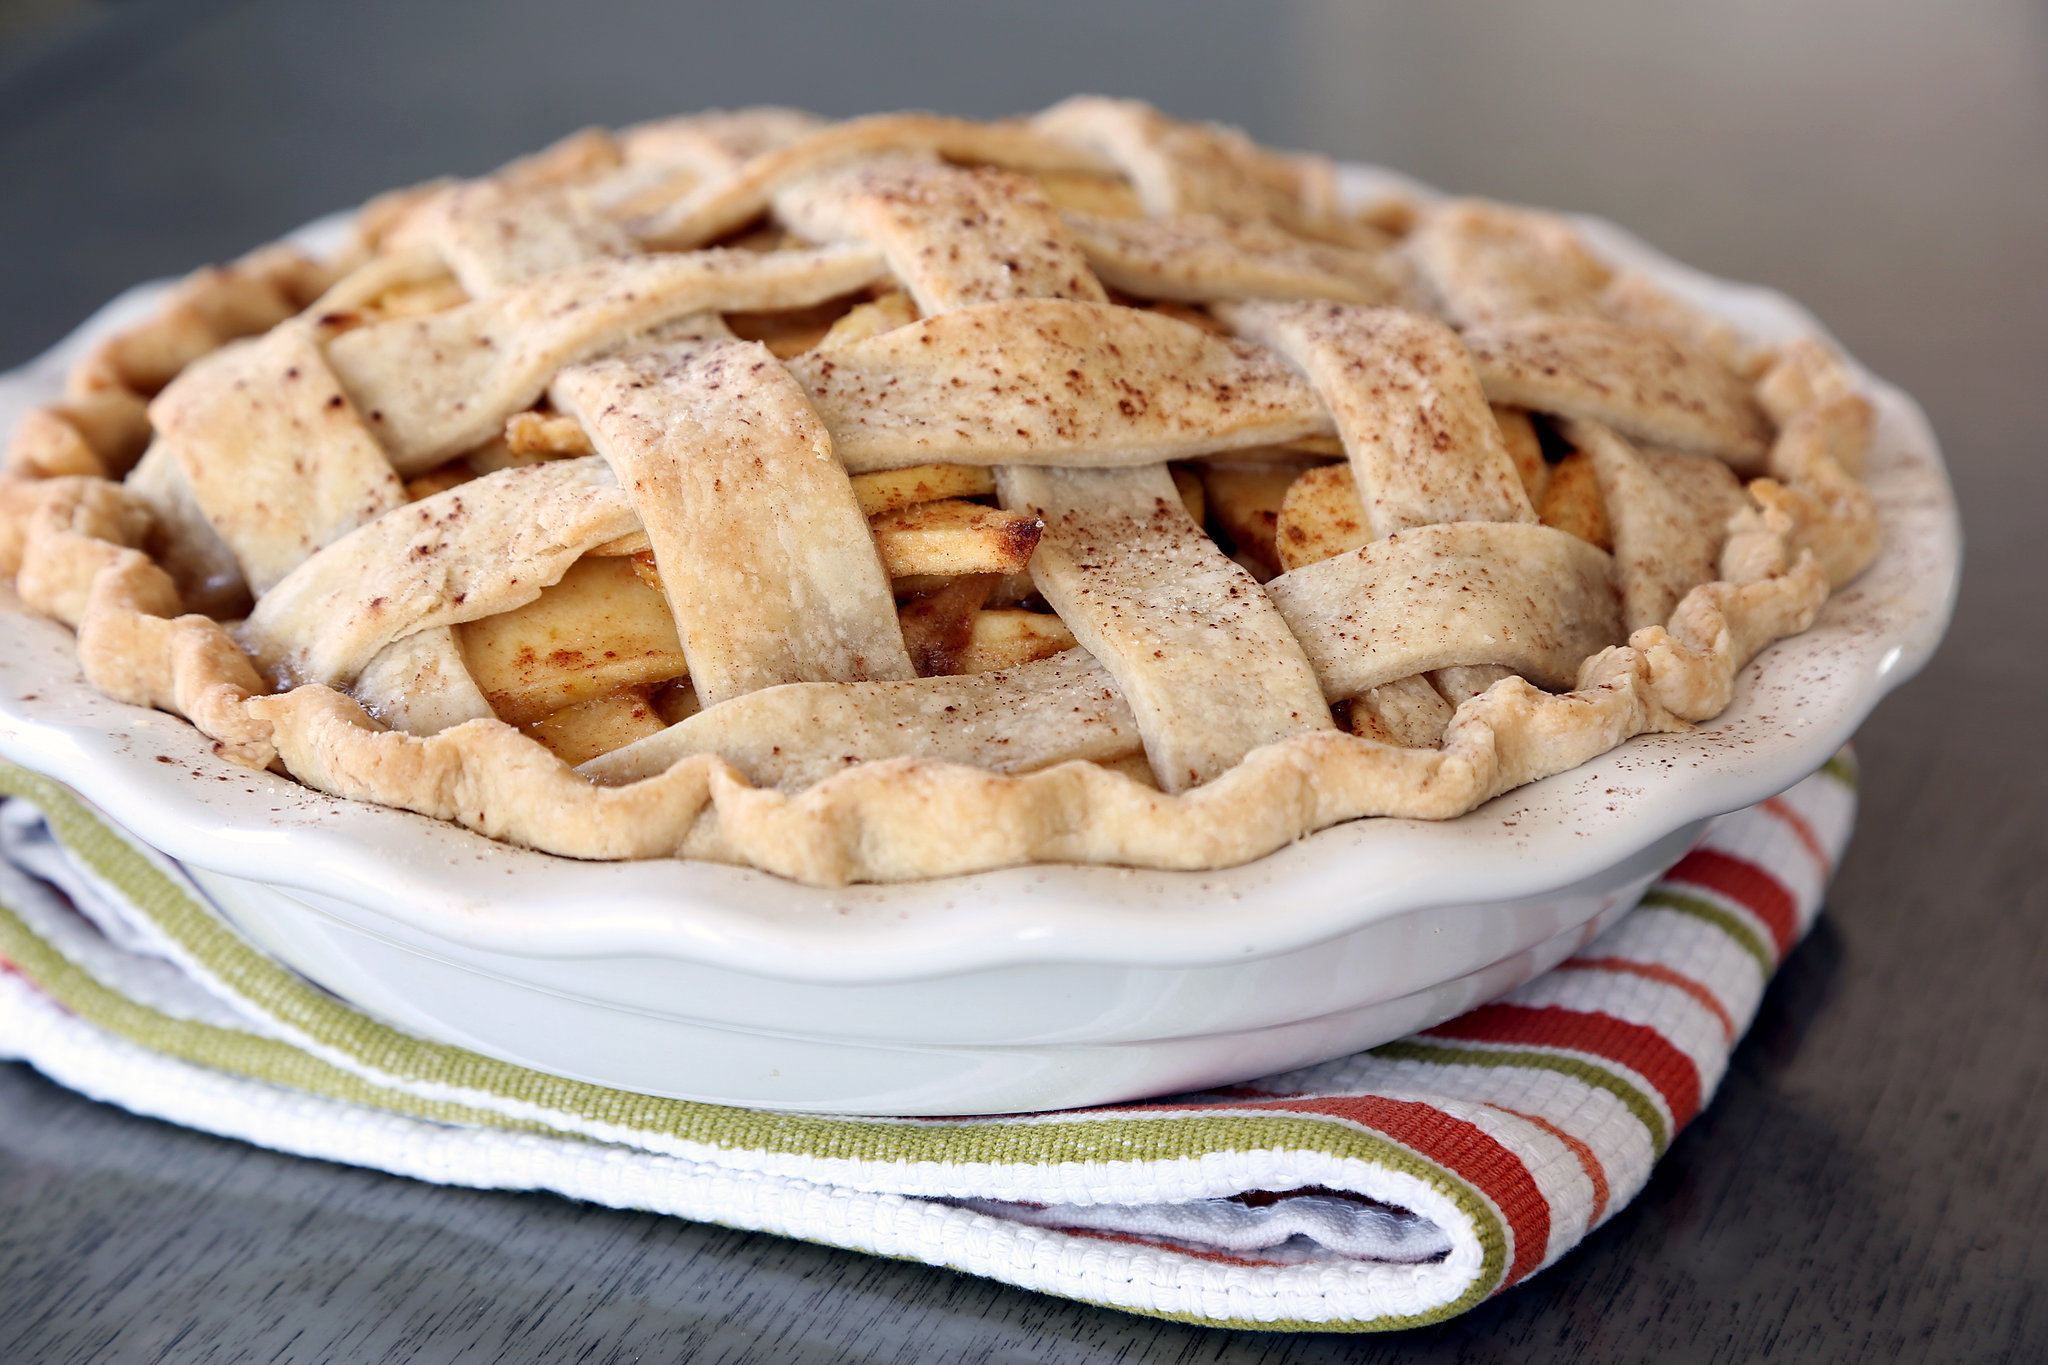 apple pie recipe with shortening popsugar food. Black Bedroom Furniture Sets. Home Design Ideas